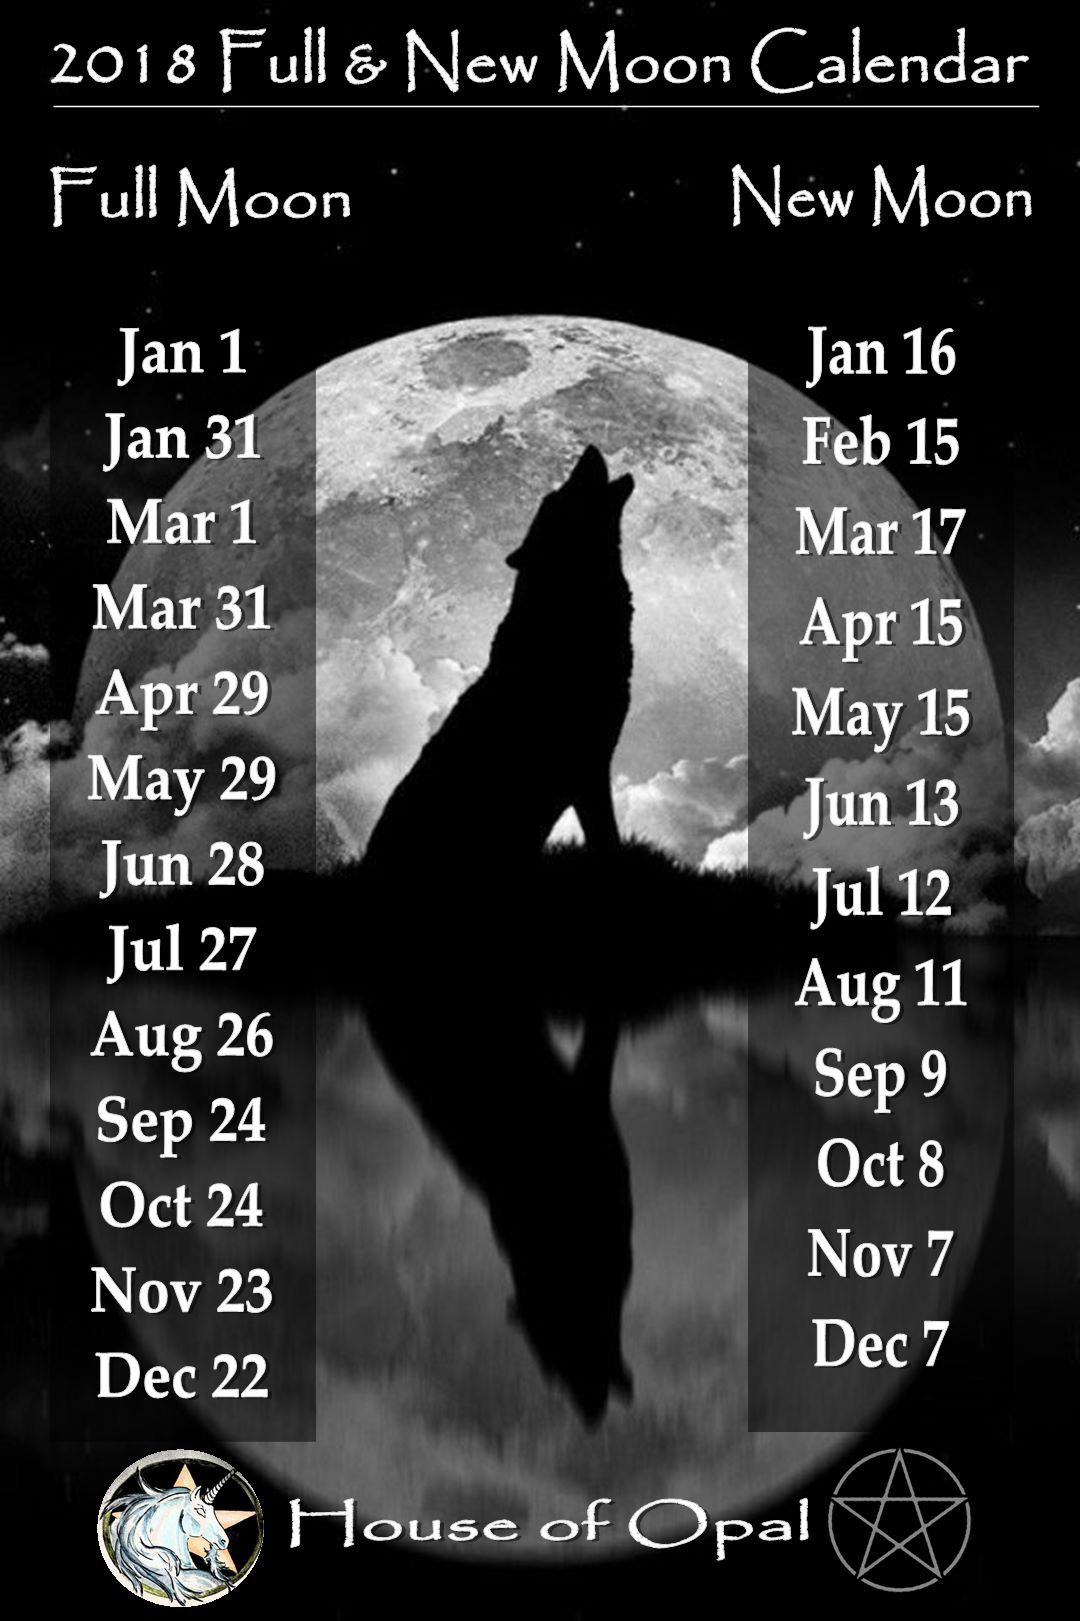 Haircut Moon Calendar May 2018 The Best Haircut Of 2018